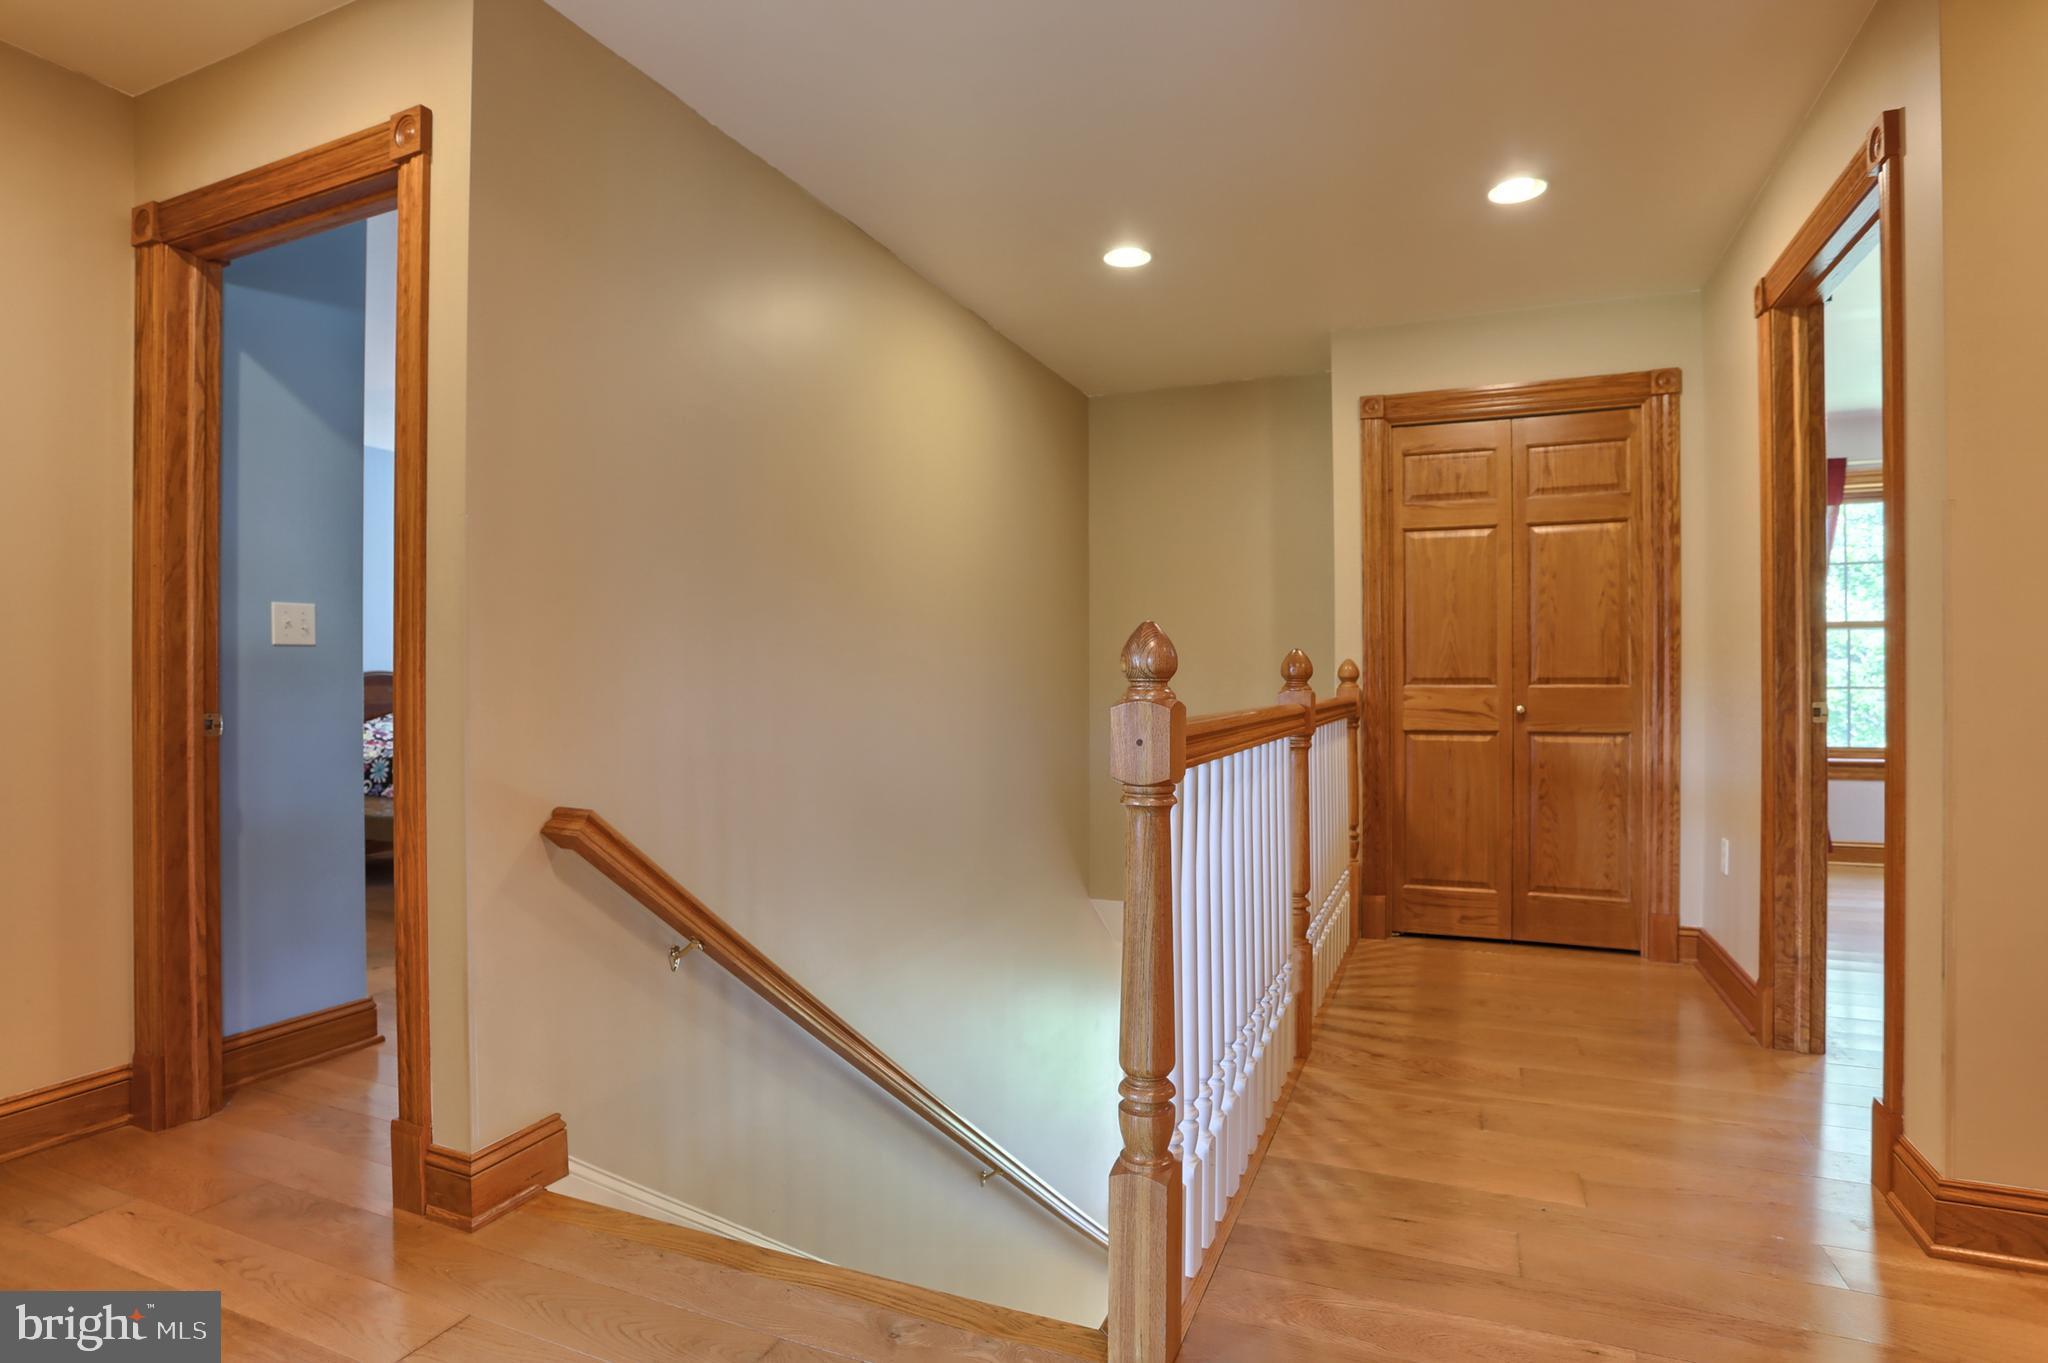 2nd floor - hall linen closet